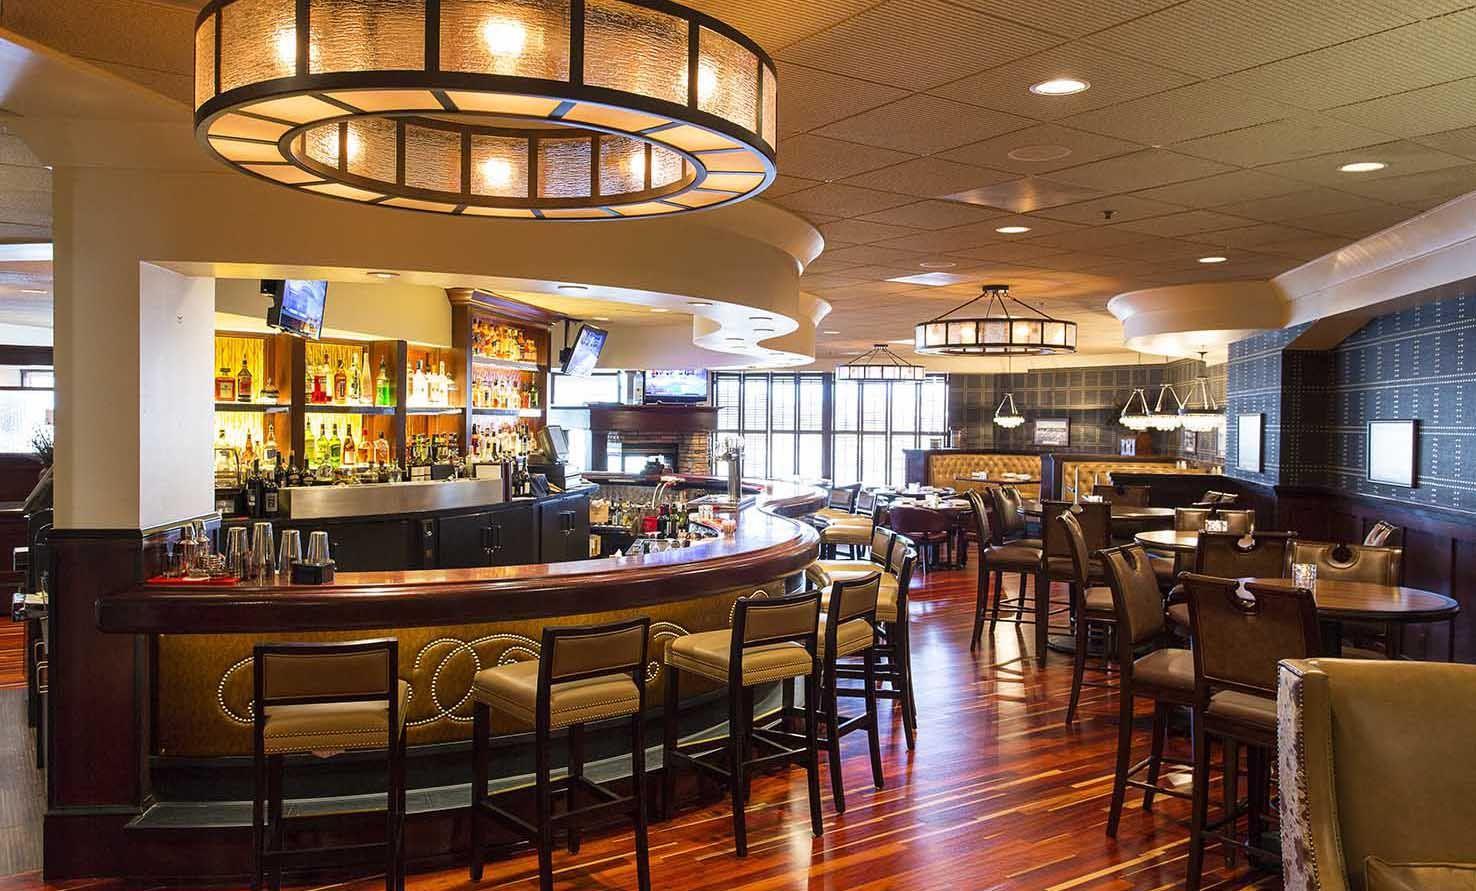 On Site Restaurant Sioux City Restaurants Kahill S Steak Fish Chophouse Ne 402 494 5025